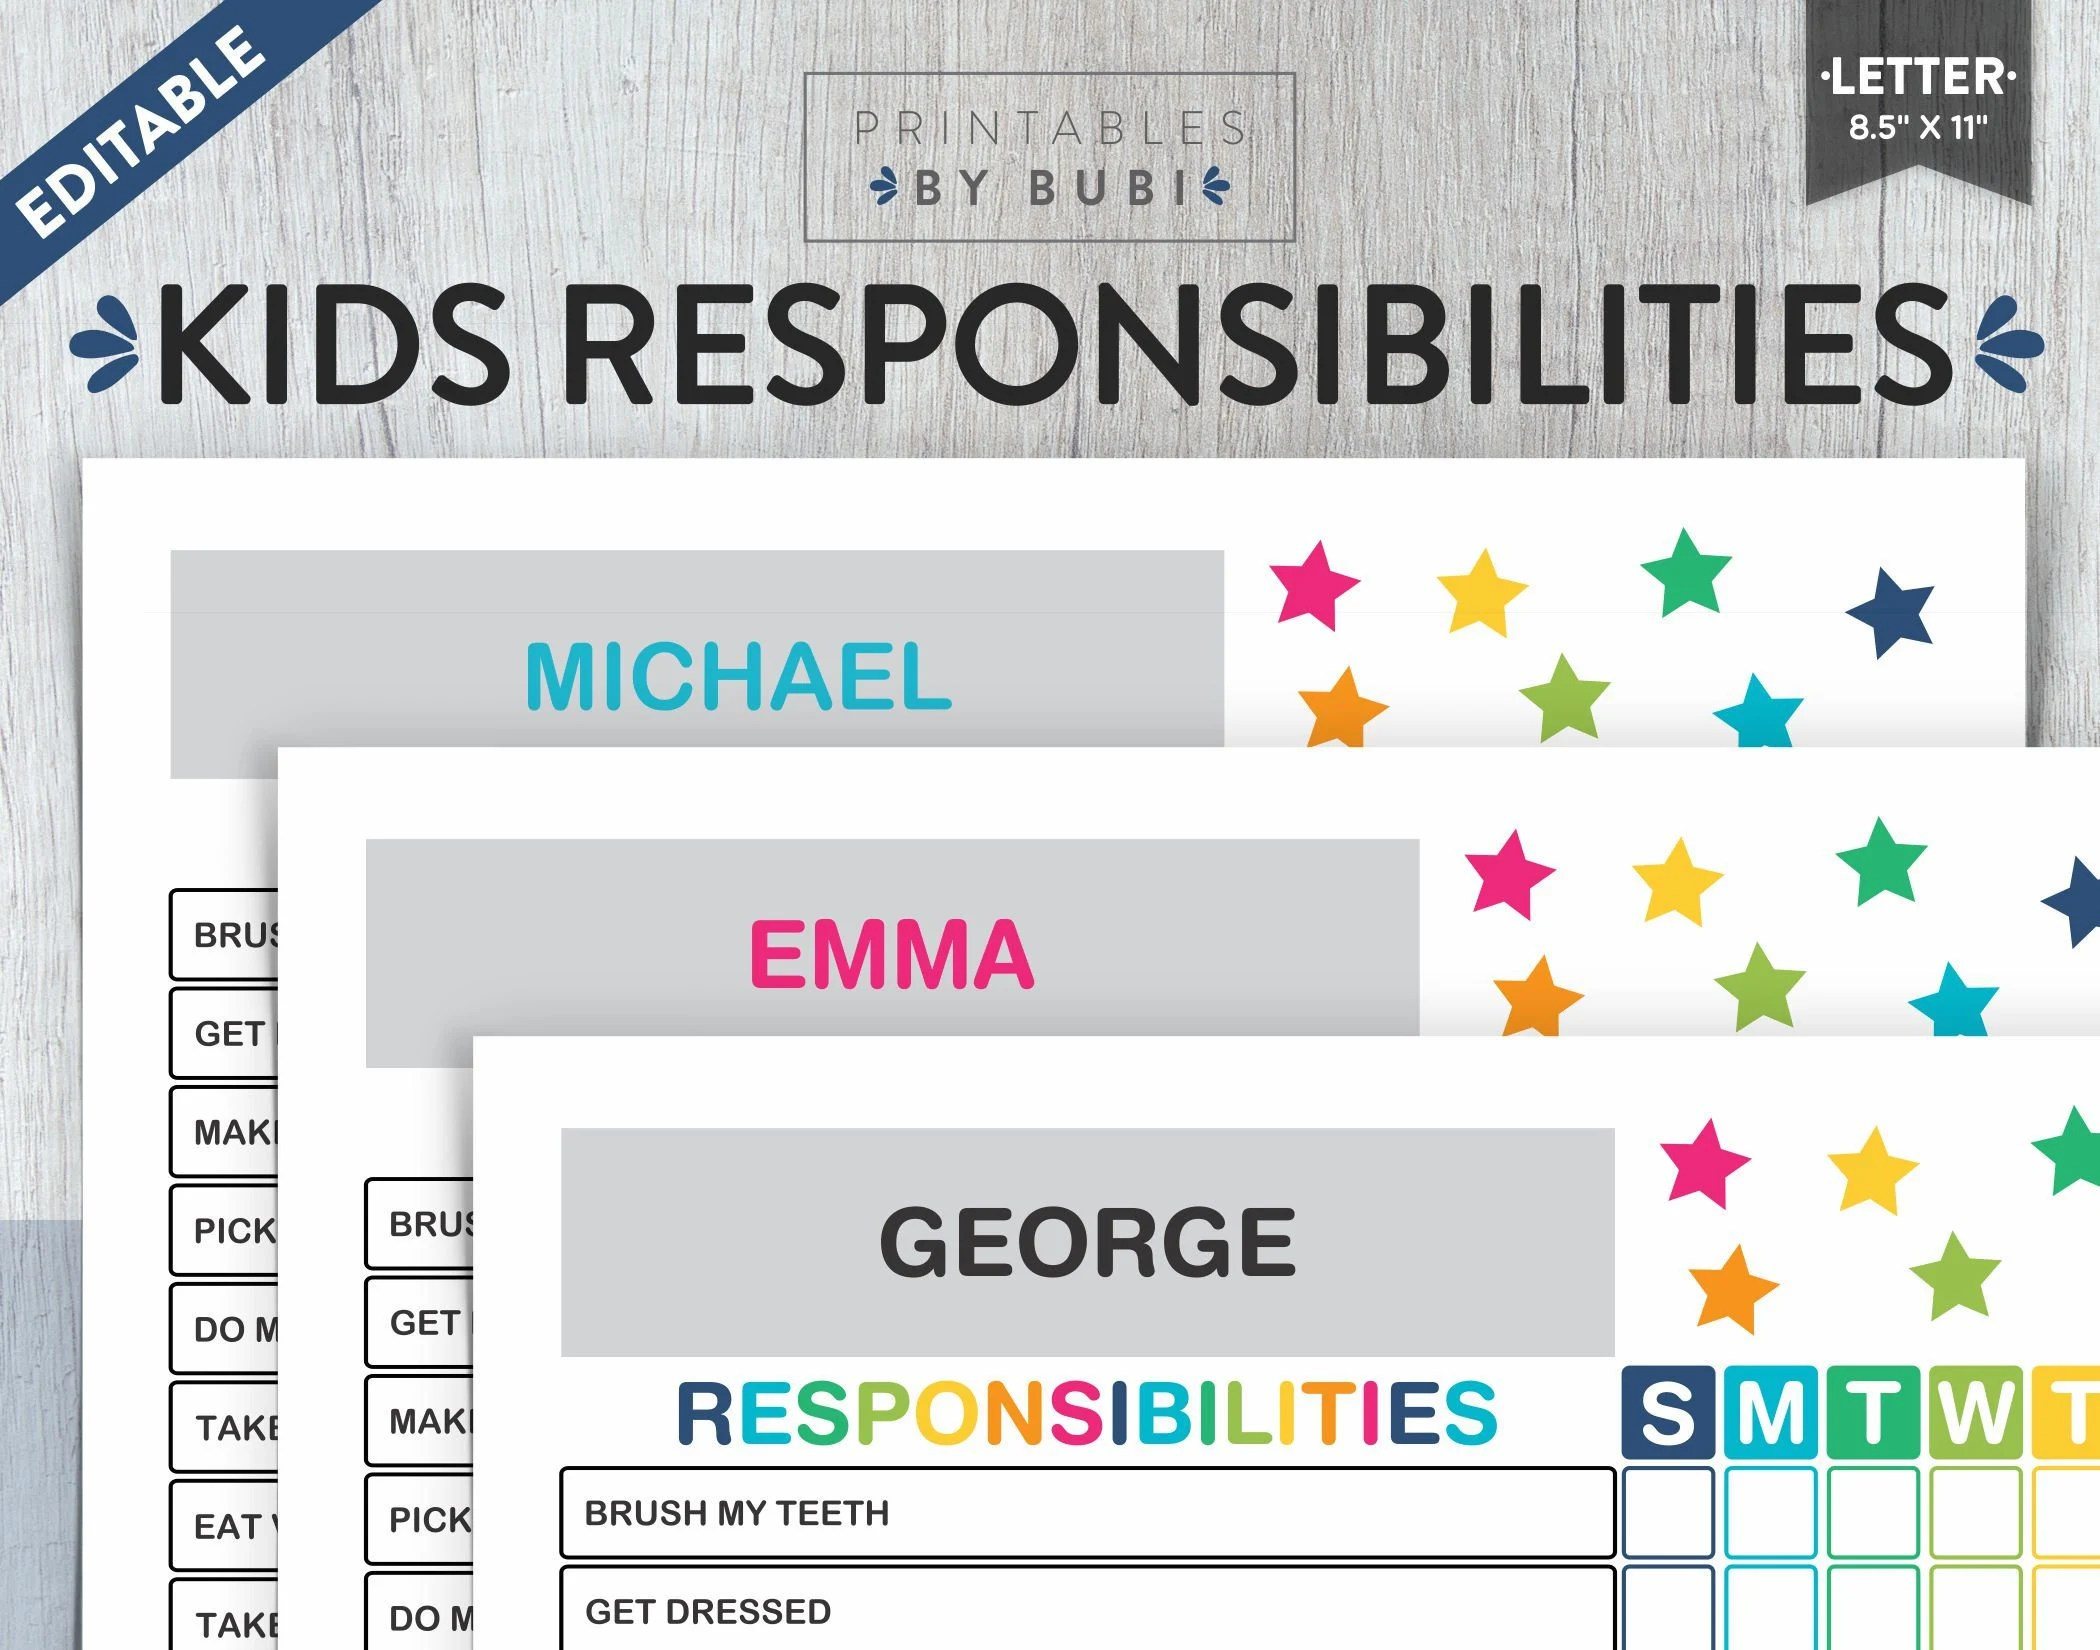 Daily Responsibilities Chart for Kids Kids Chore Chart Etsy - kids chart